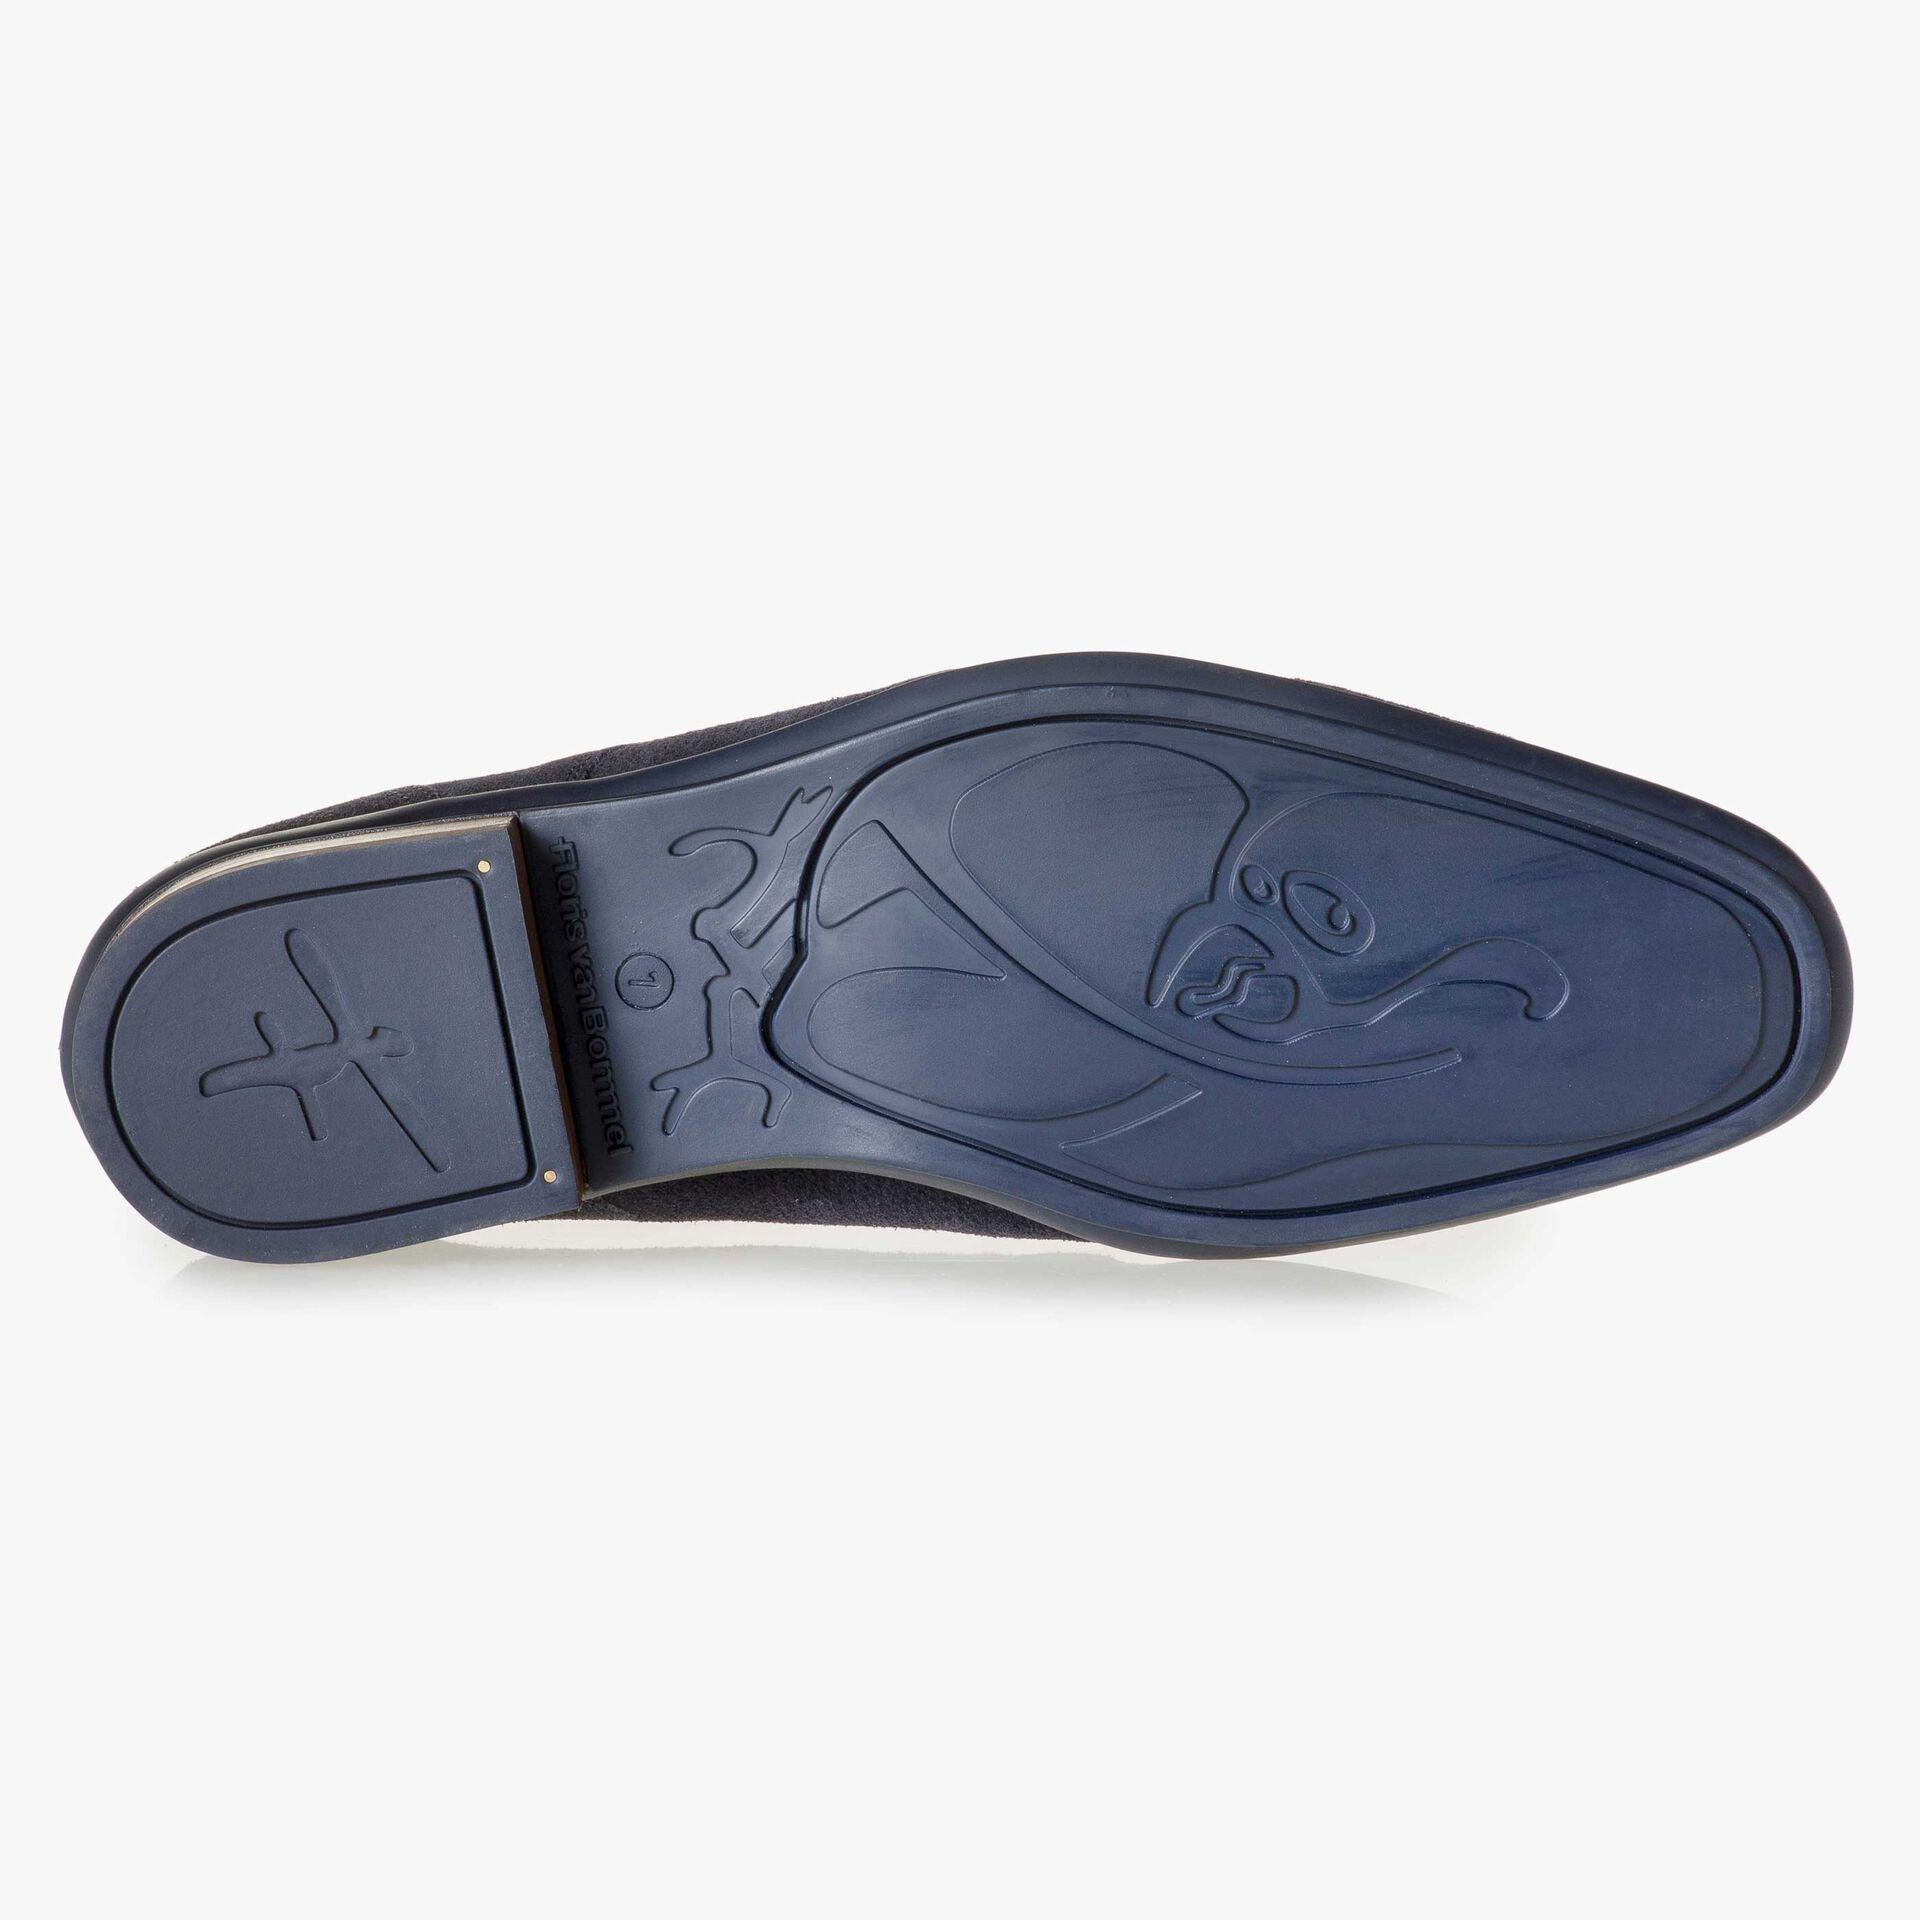 Blue suede leather lace shoe